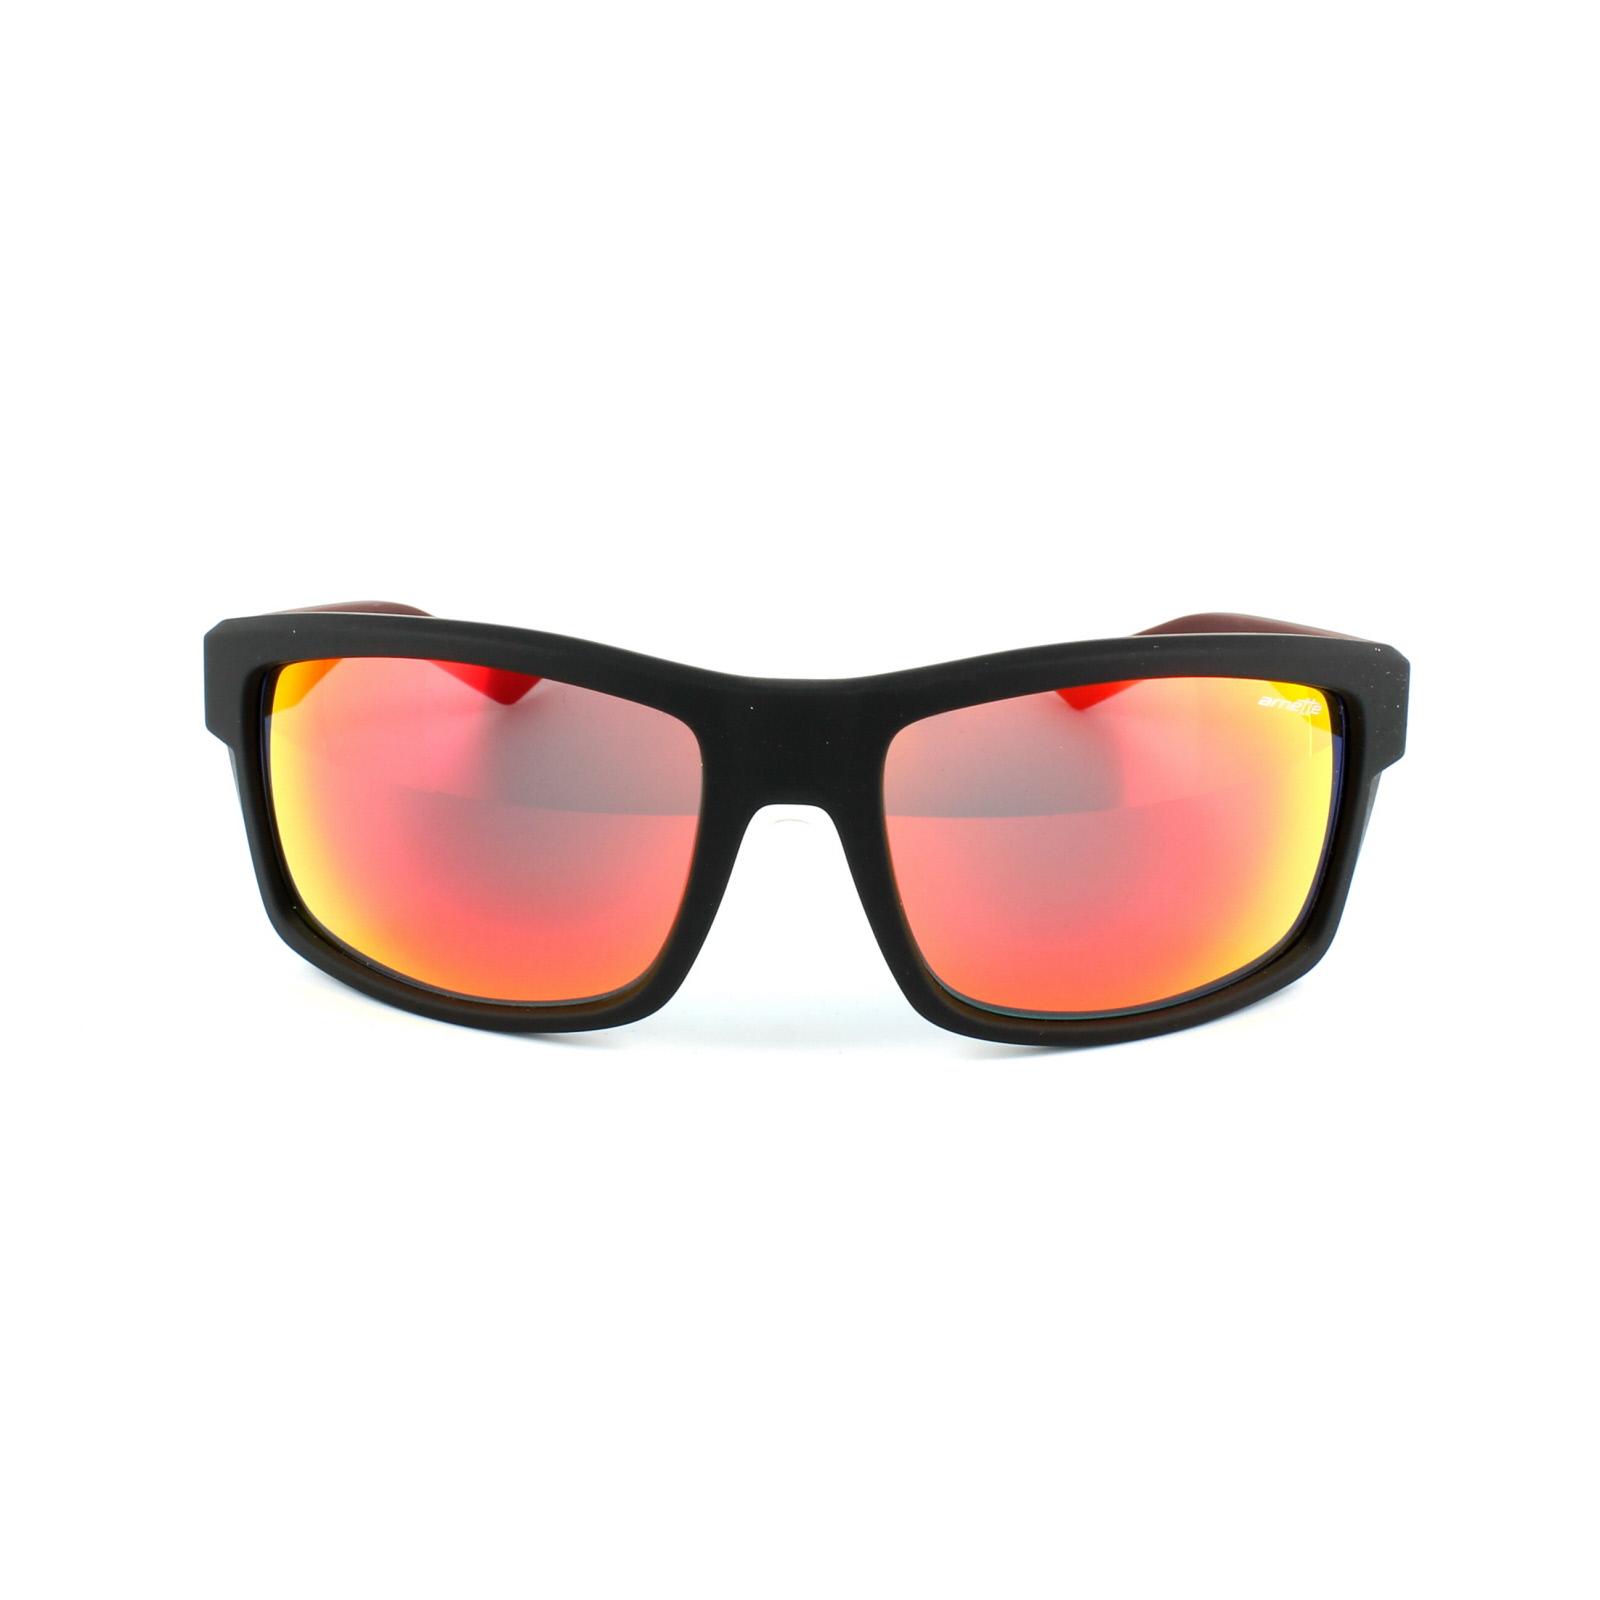 3bb6aced12e Sentinel Arnette Sunglasses 4216 Corner Man 23266Q Black   Burgundy Red  Mirror